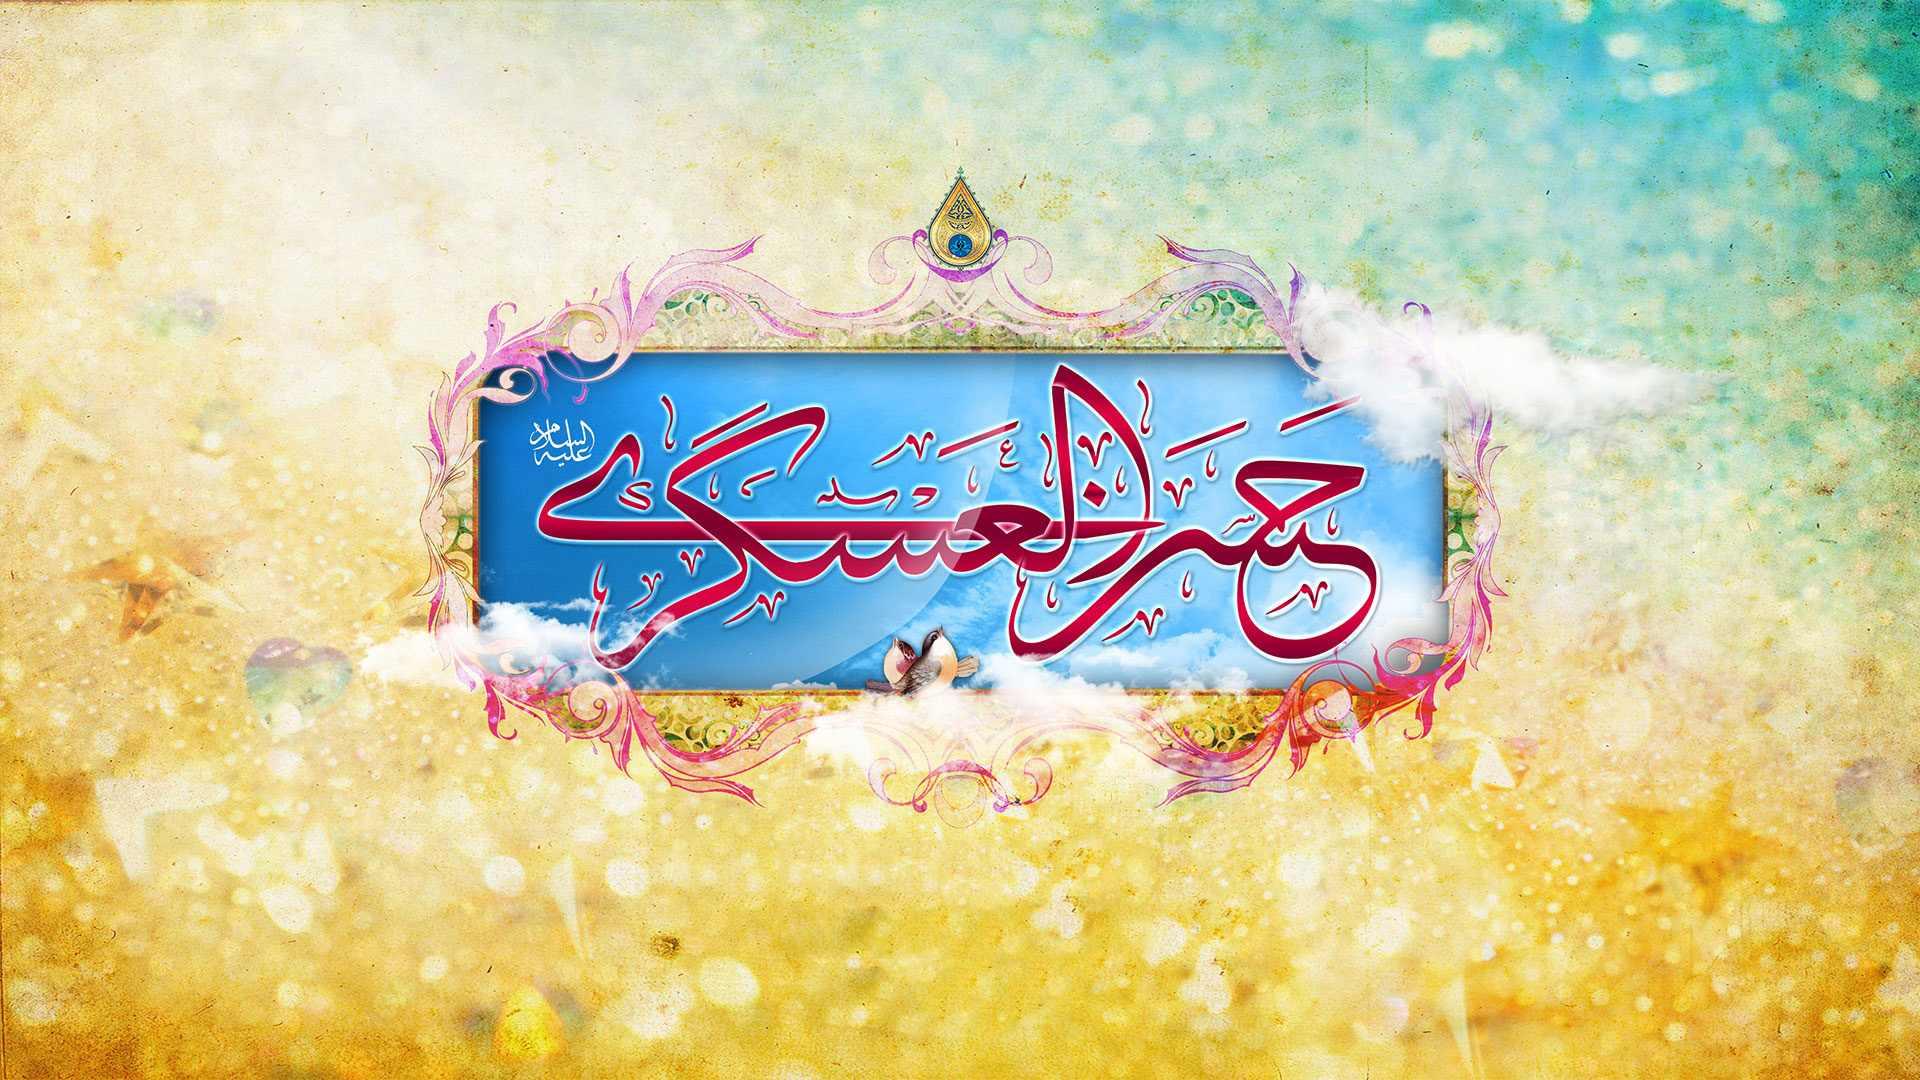 تصویر از گلچین مولودی ویژه ولادت امام حسن عسکری (علیه السلام)